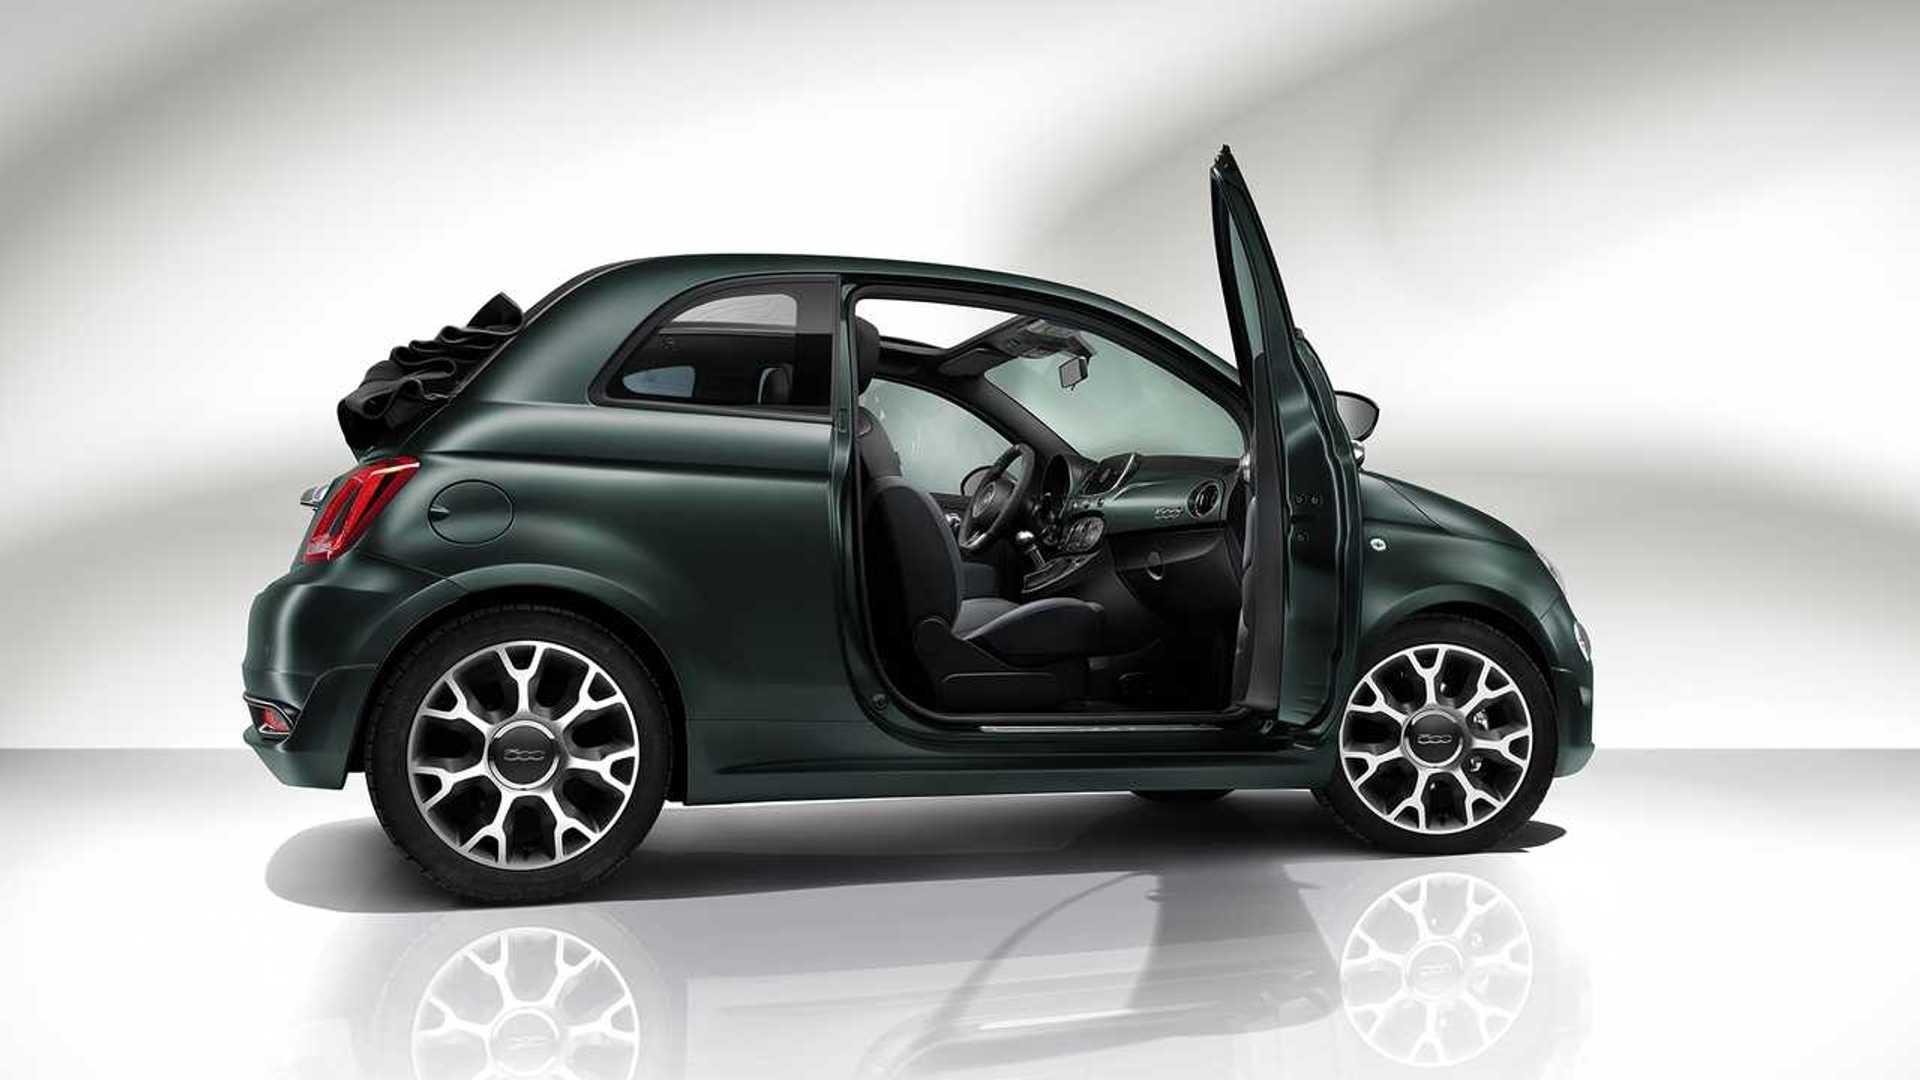 Latest Top End Fiat 500 Is A Stylish Rockstar